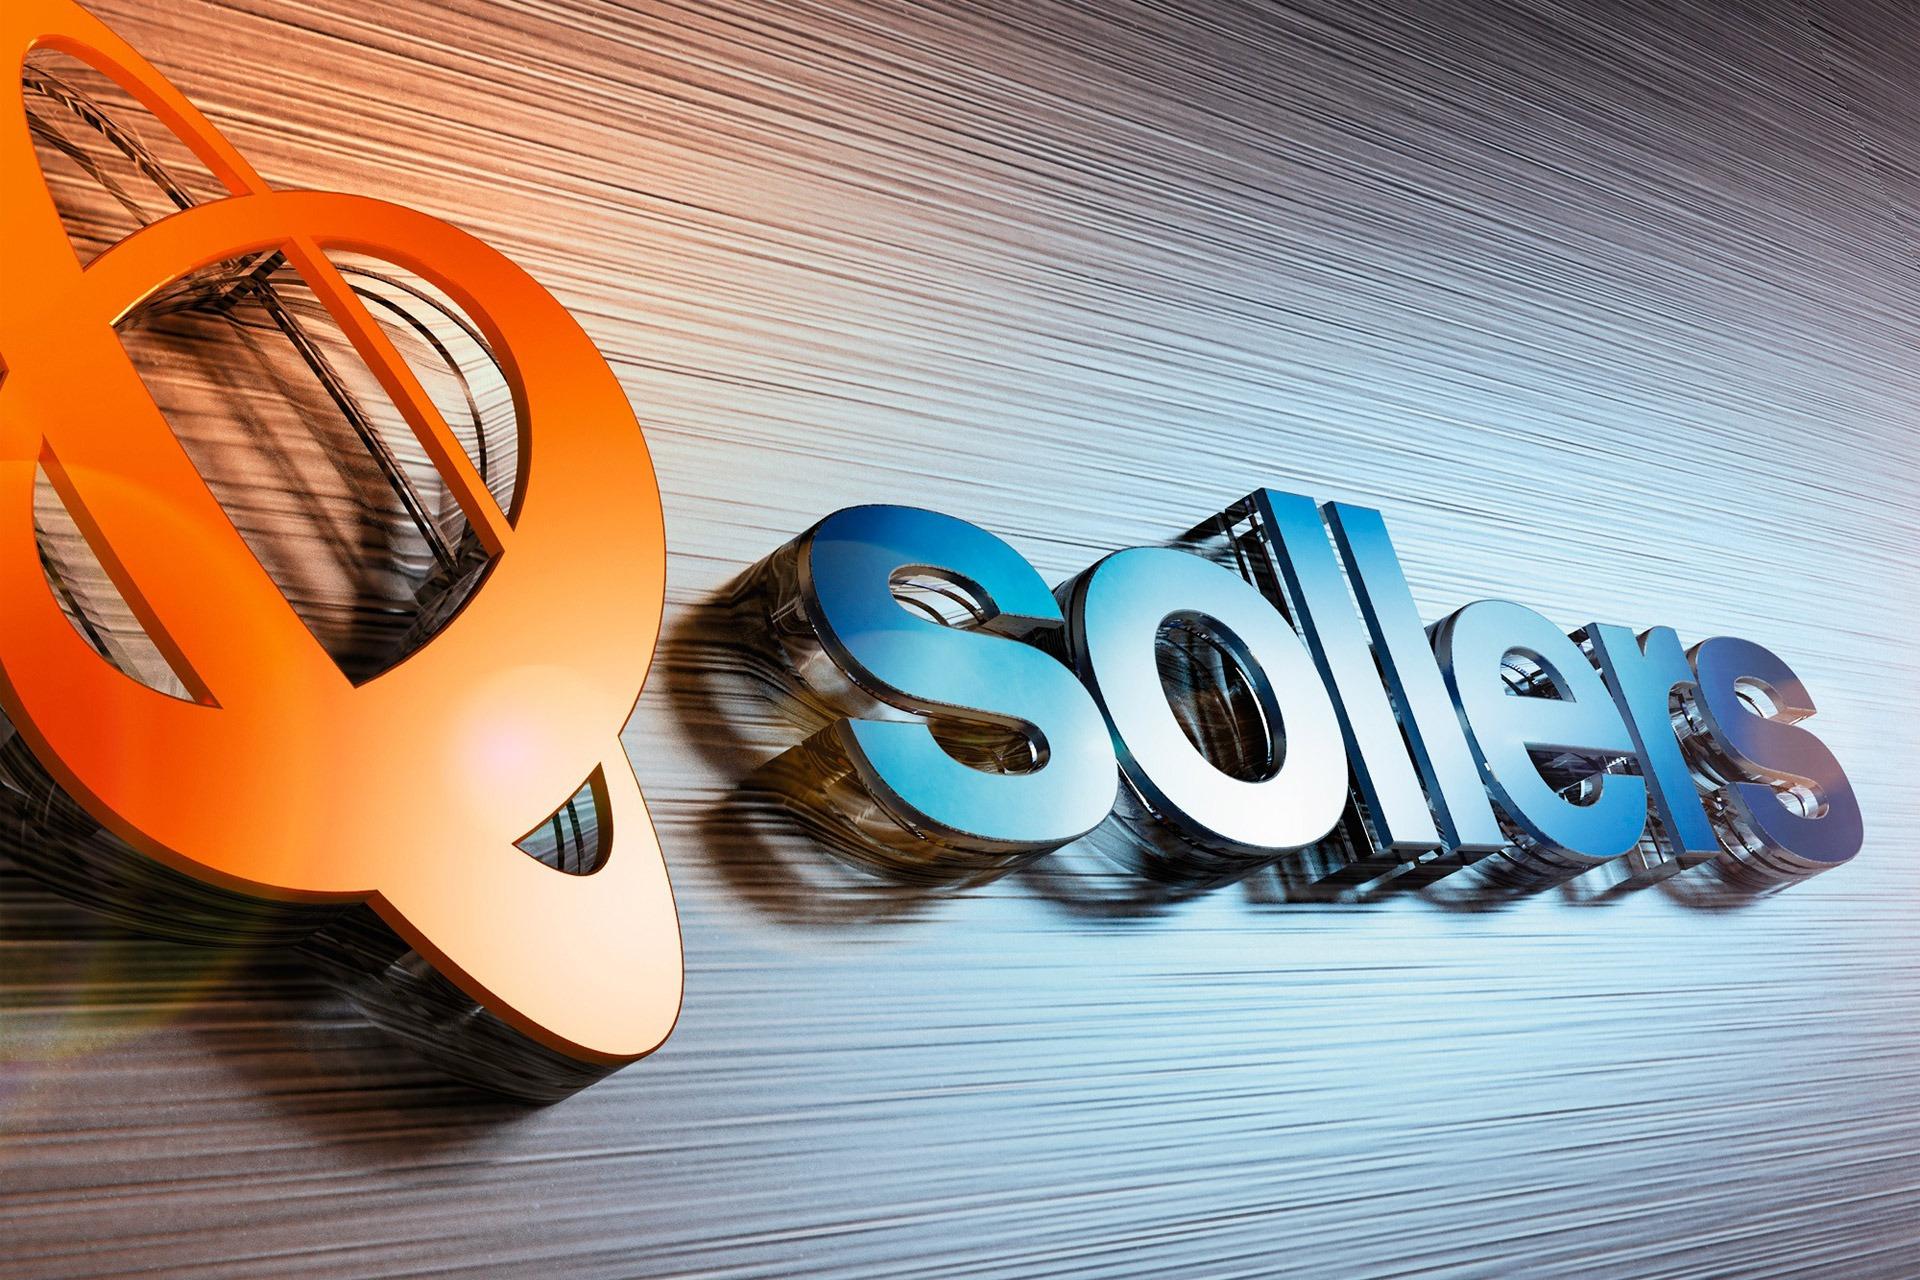 Asgard Брендинг, Фирменный стиль, ребрендинг Sollers, дизайн логотипа